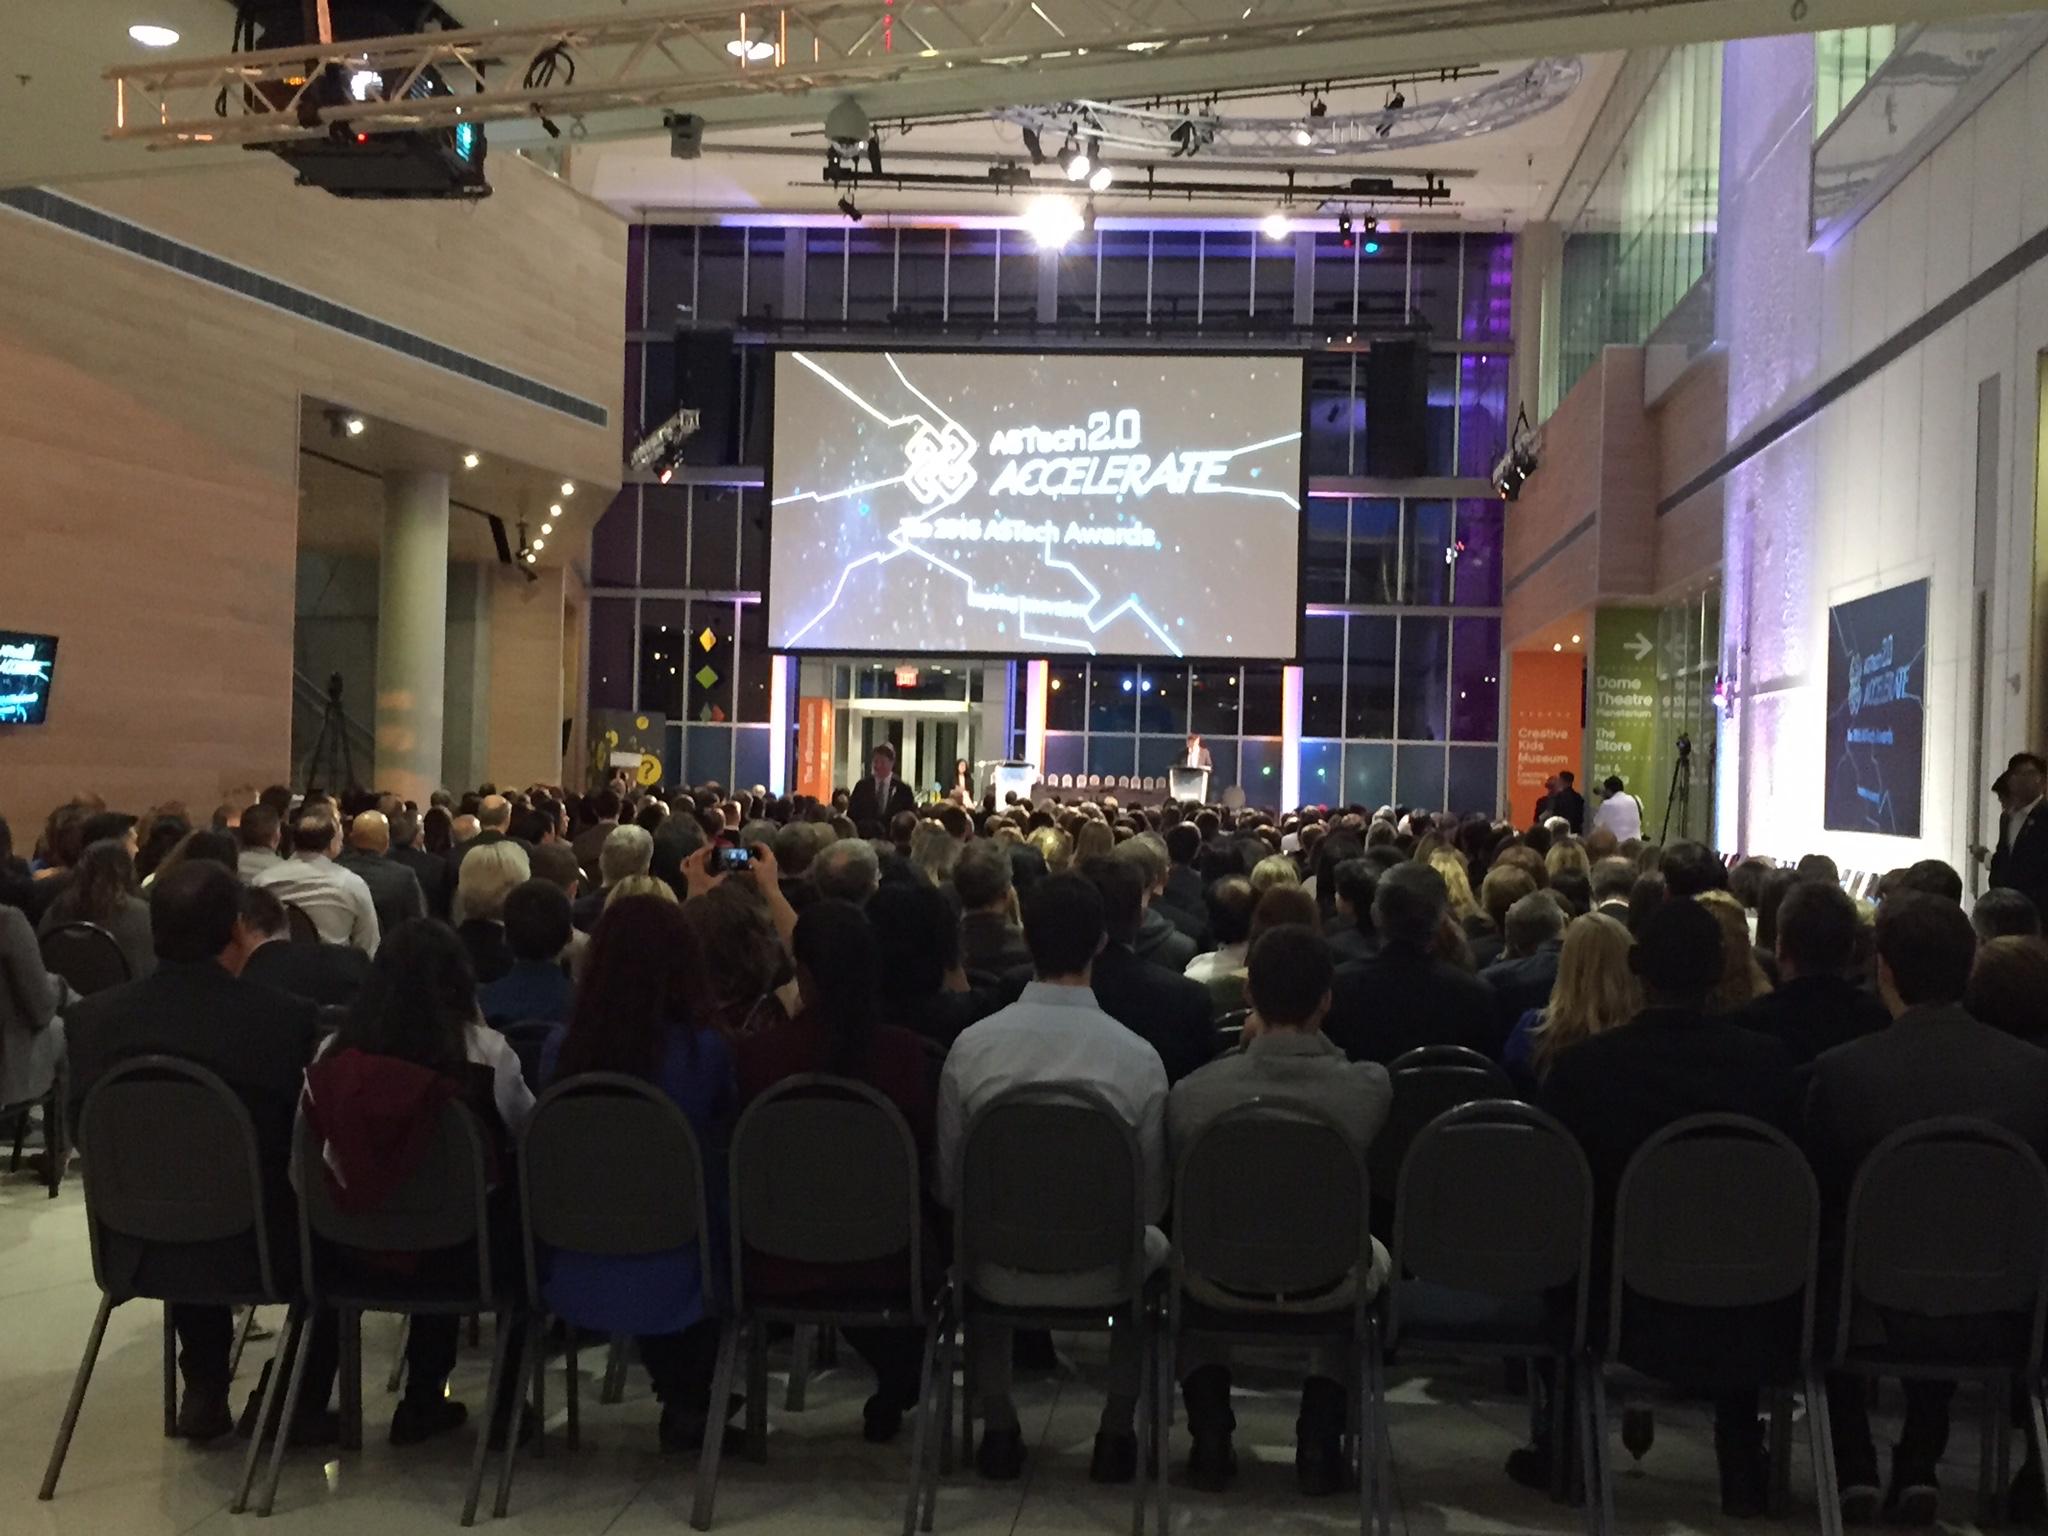 ASTech 2015 Awards Gala at TELUS Spark in Calgary on November 6th, 2015